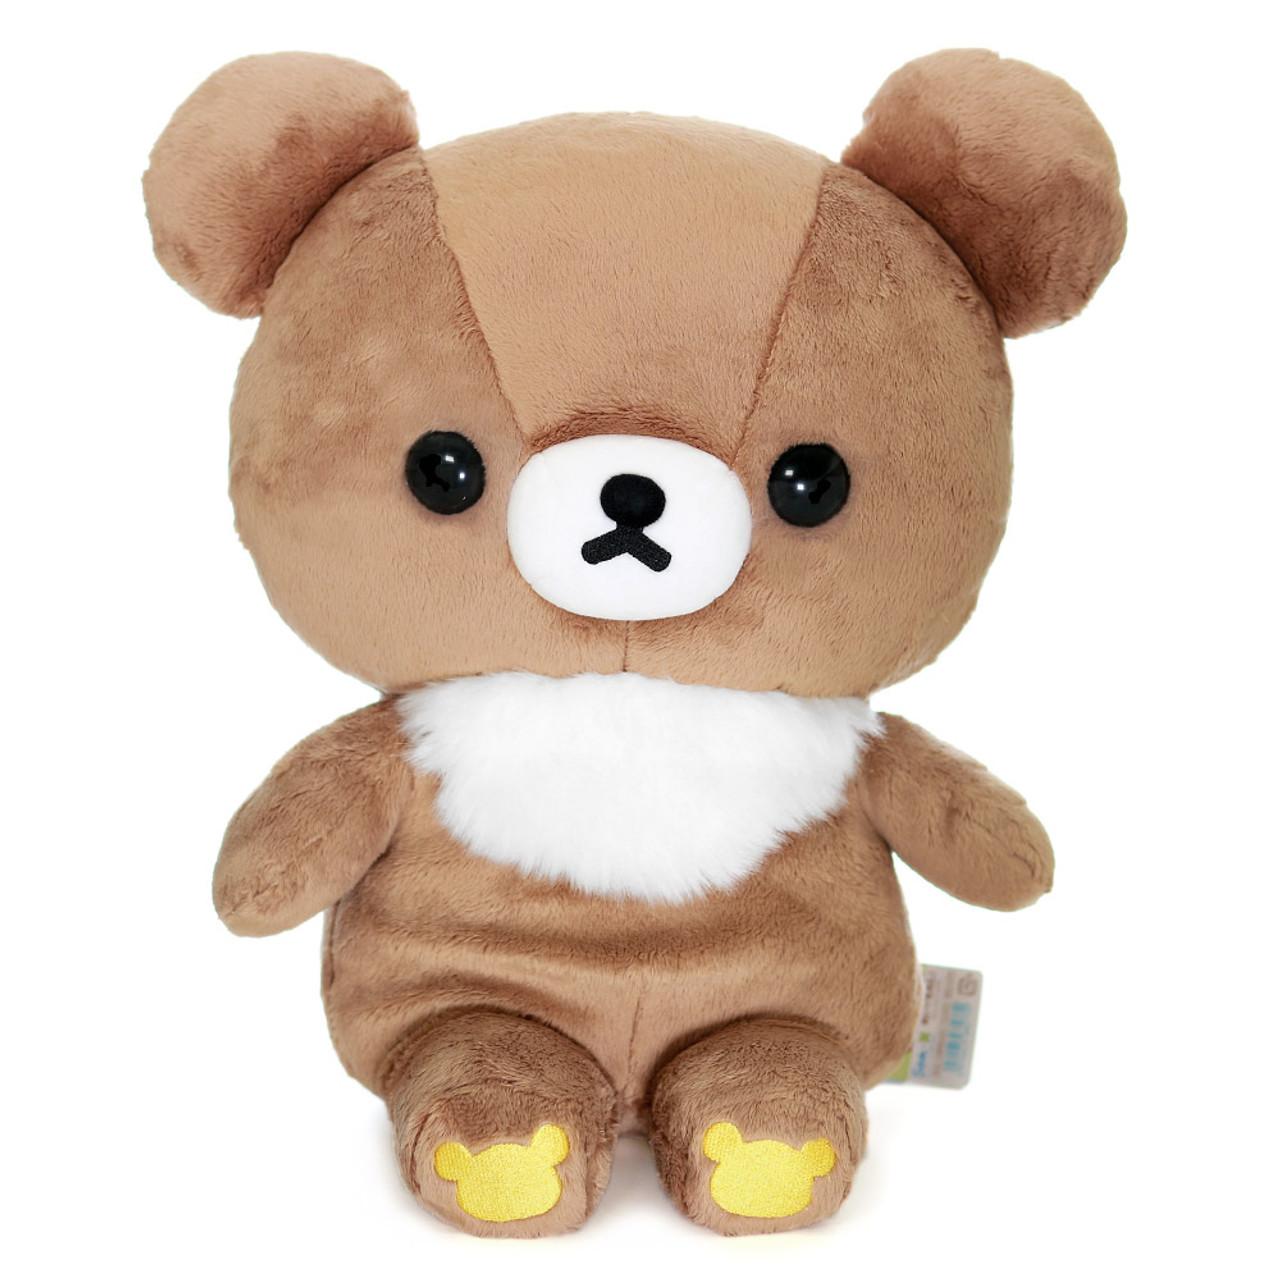 San-x Cute Sweet Chairoikoguma Bear Stuffed Animal Toy L MR94401 ( Front View )